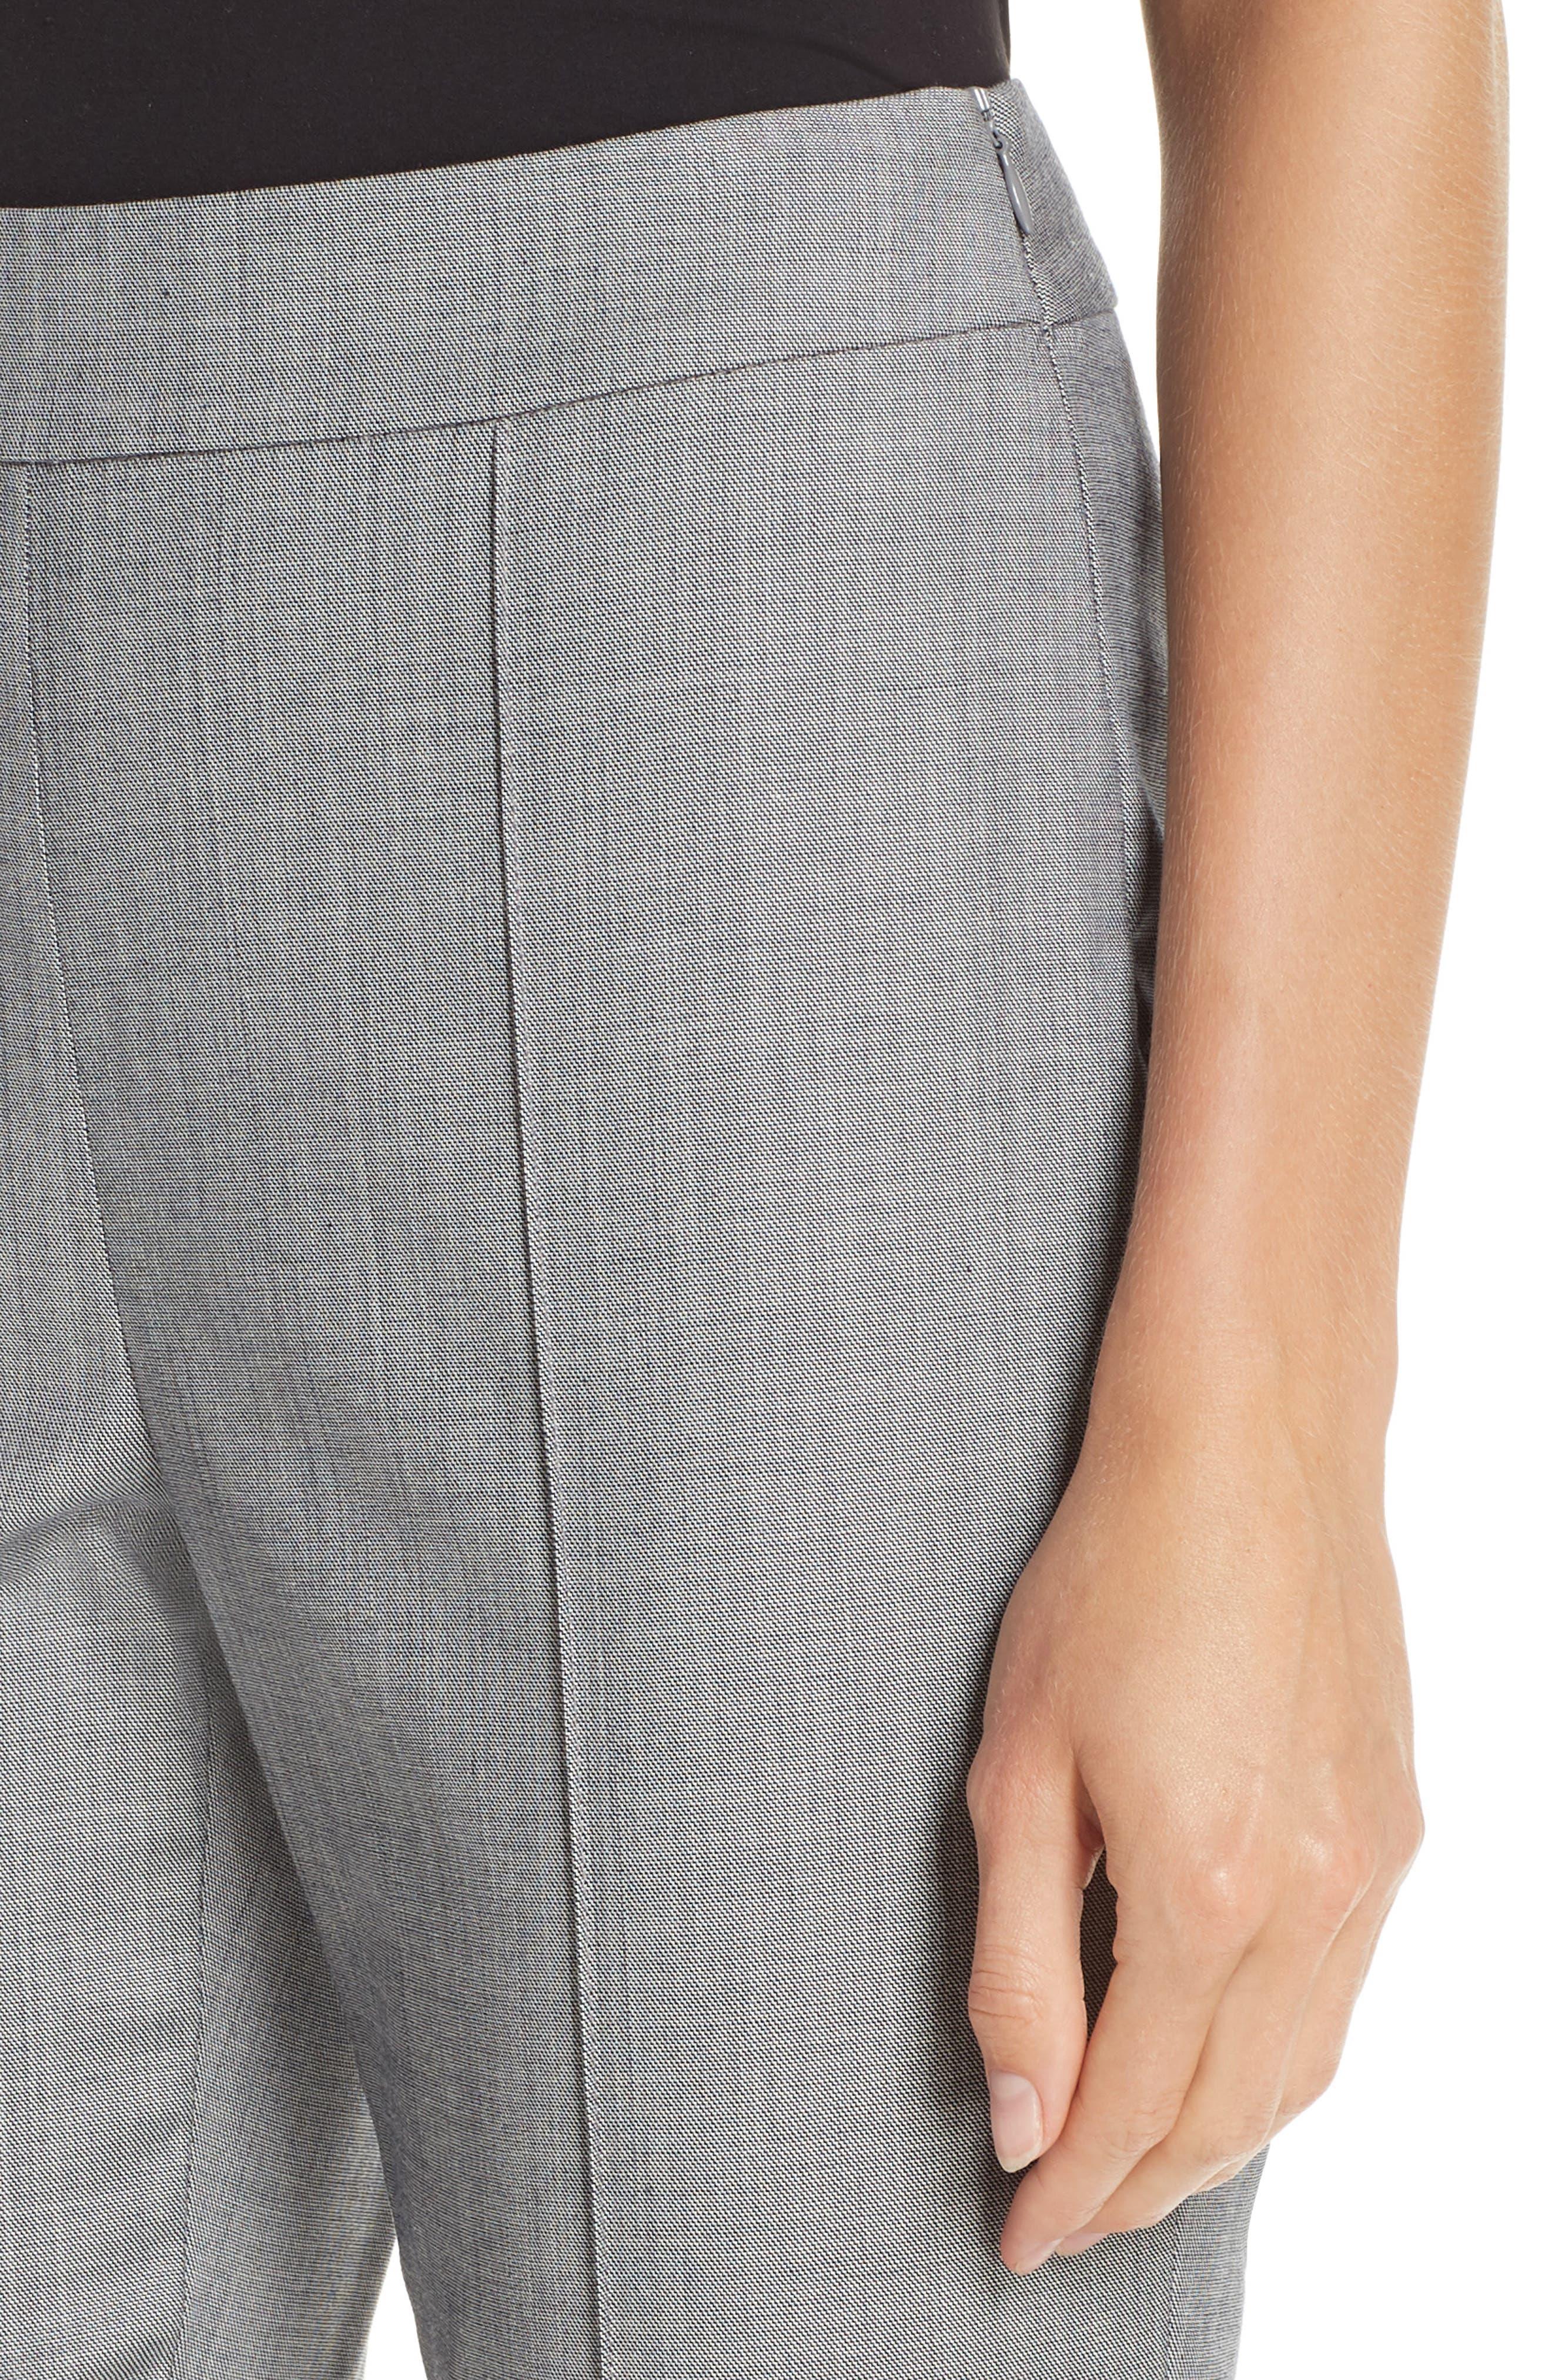 Sharkskin Stretch Wool Blend Skinny Ankle Pants,                             Alternate thumbnail 4, color,                             GREY MULTI